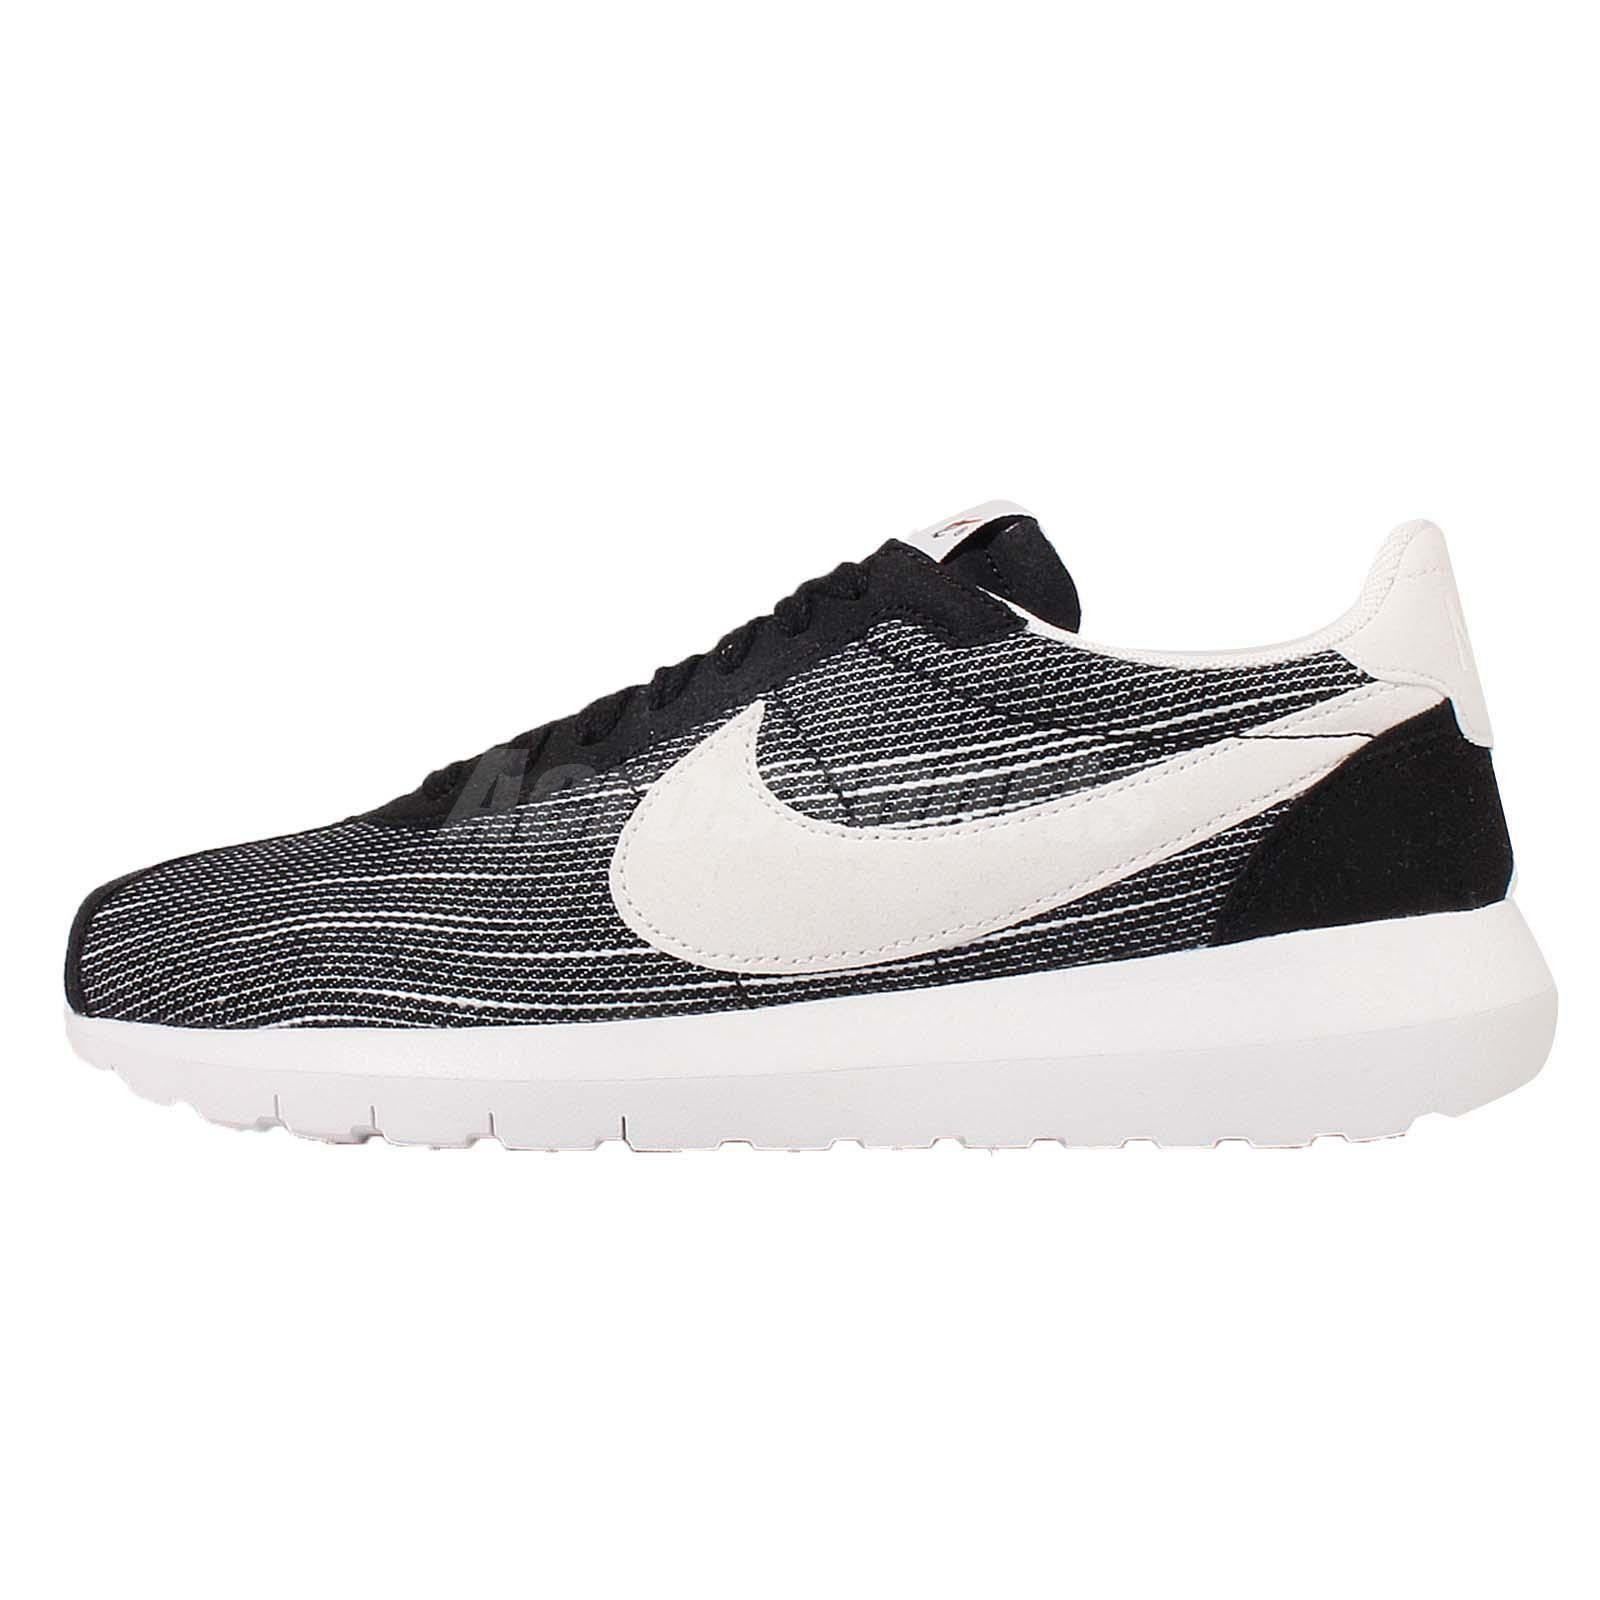 timeless design e3eac db182 Wmns Nike Roshe LD-1000 One Cortez Black White Womens Running Shoes  819843-005